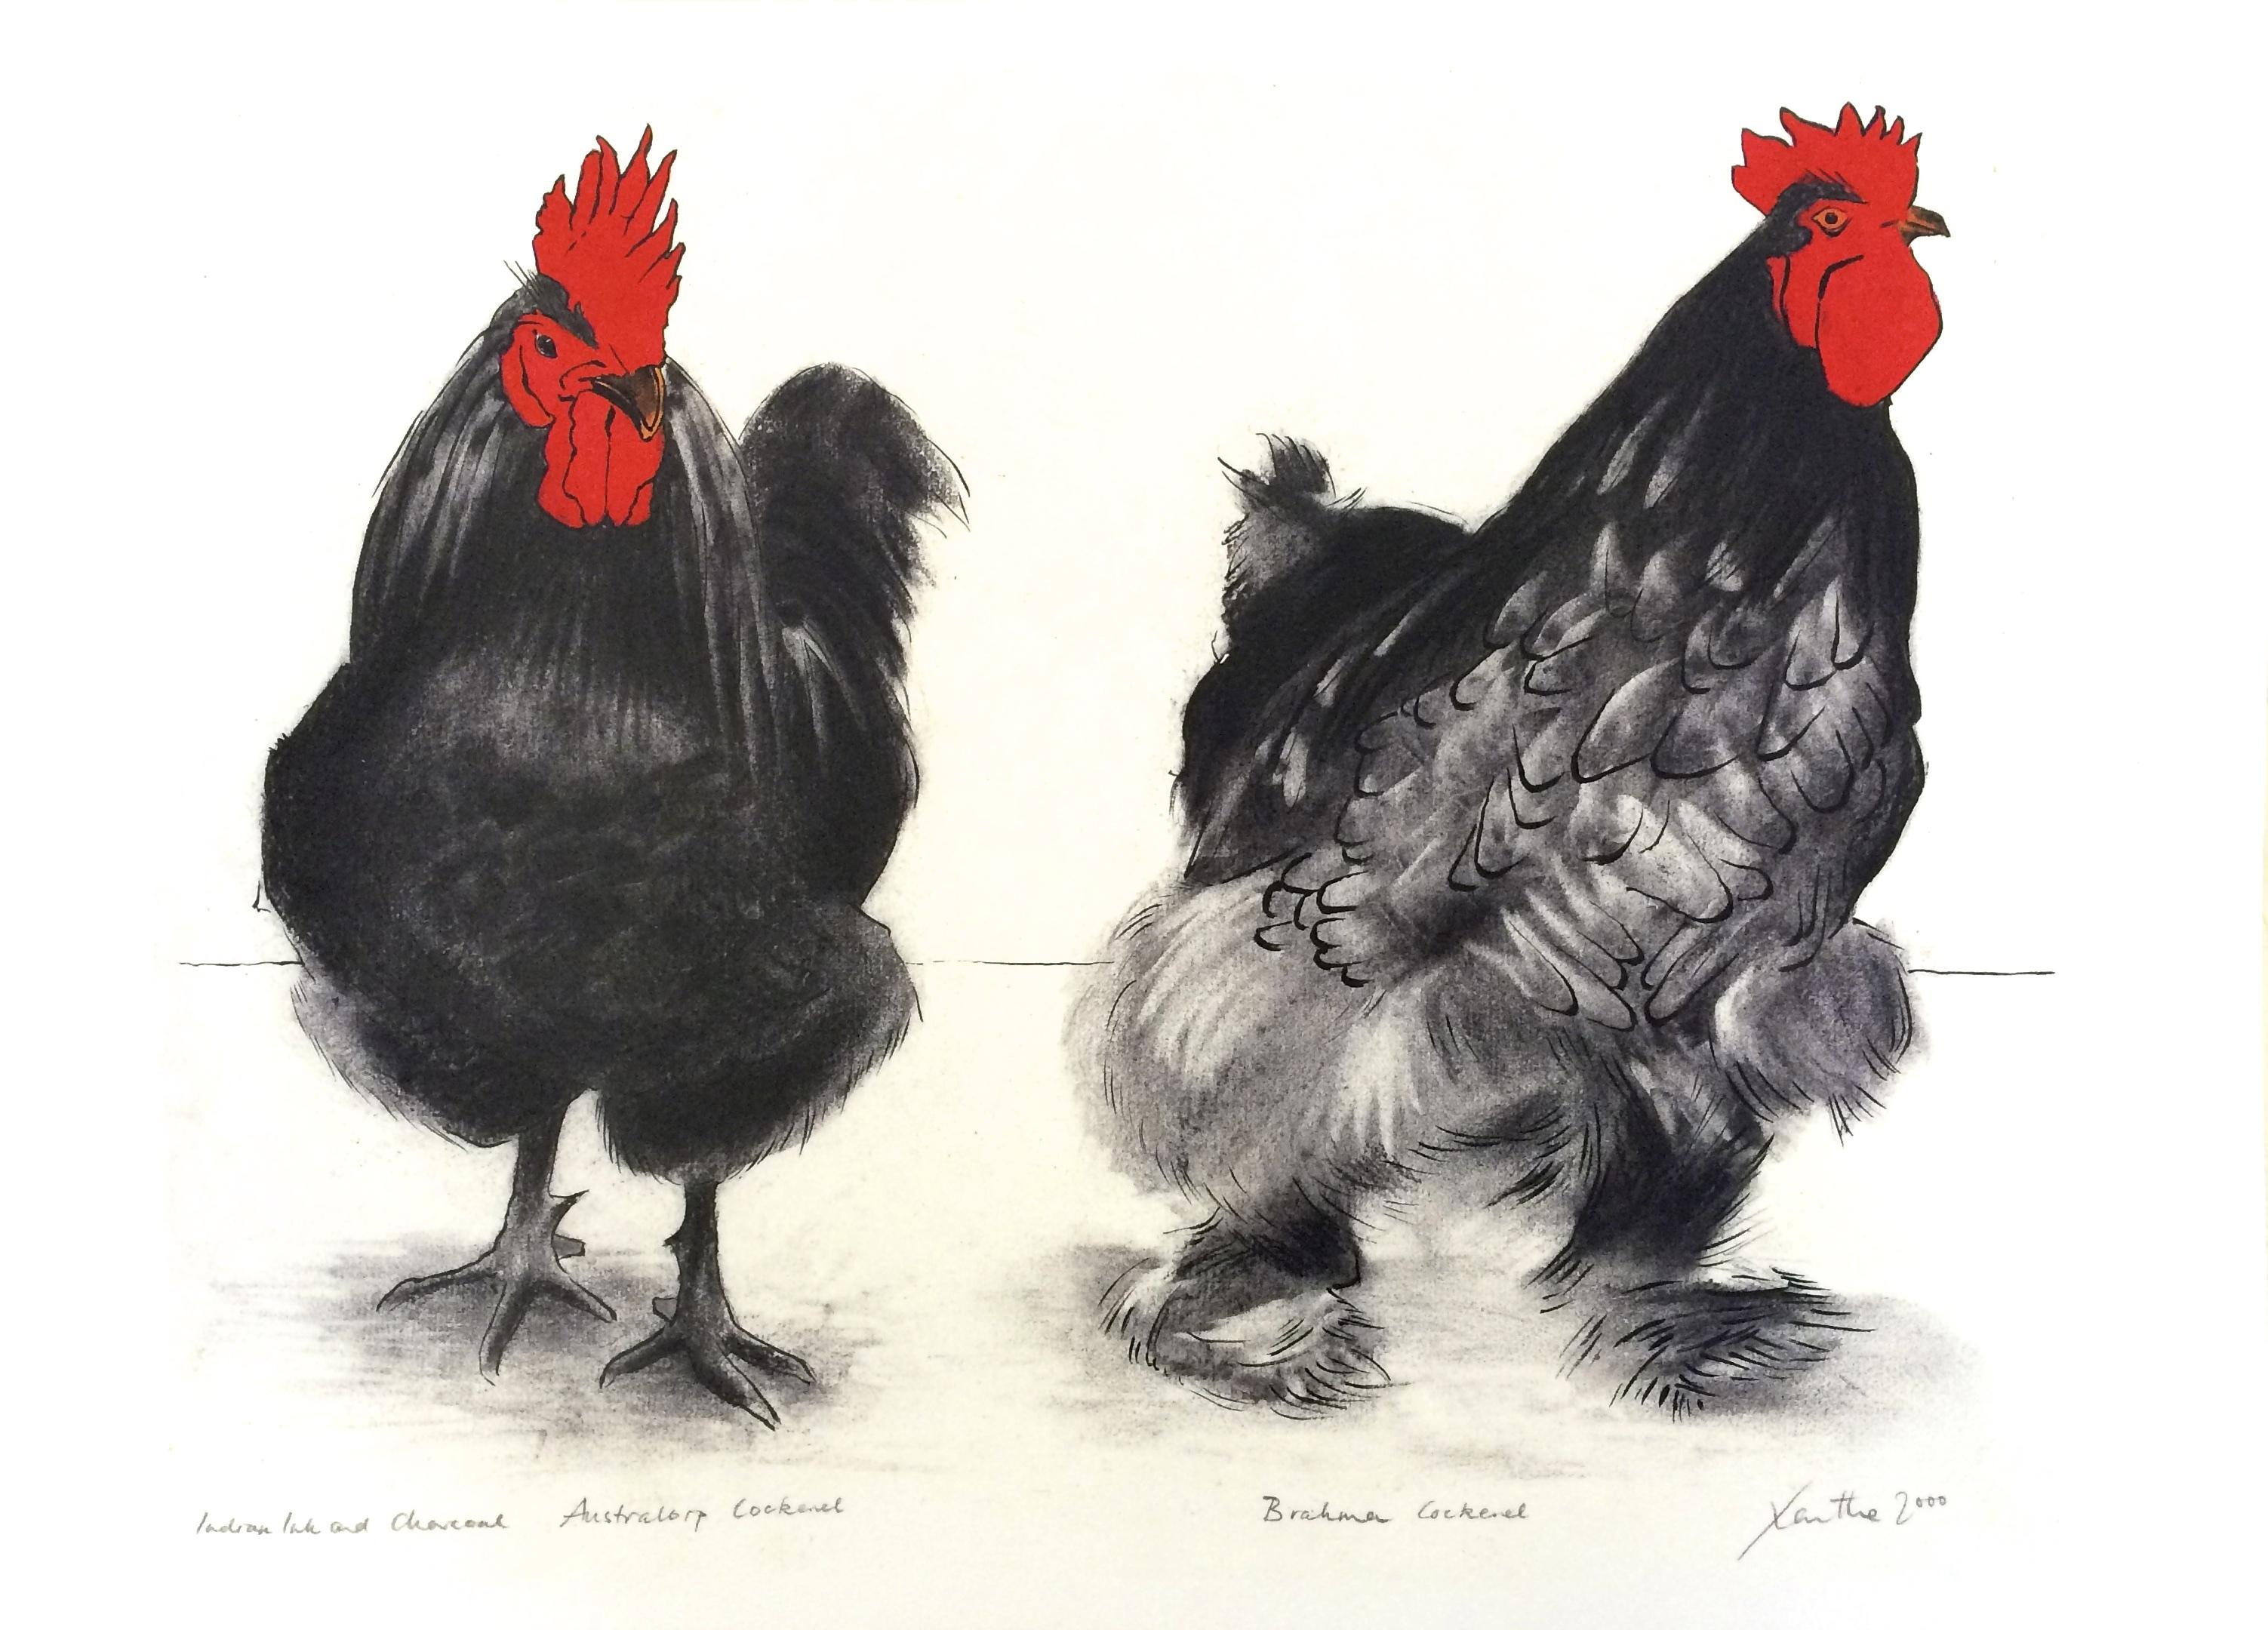 Australorp and Brahma Cockerels